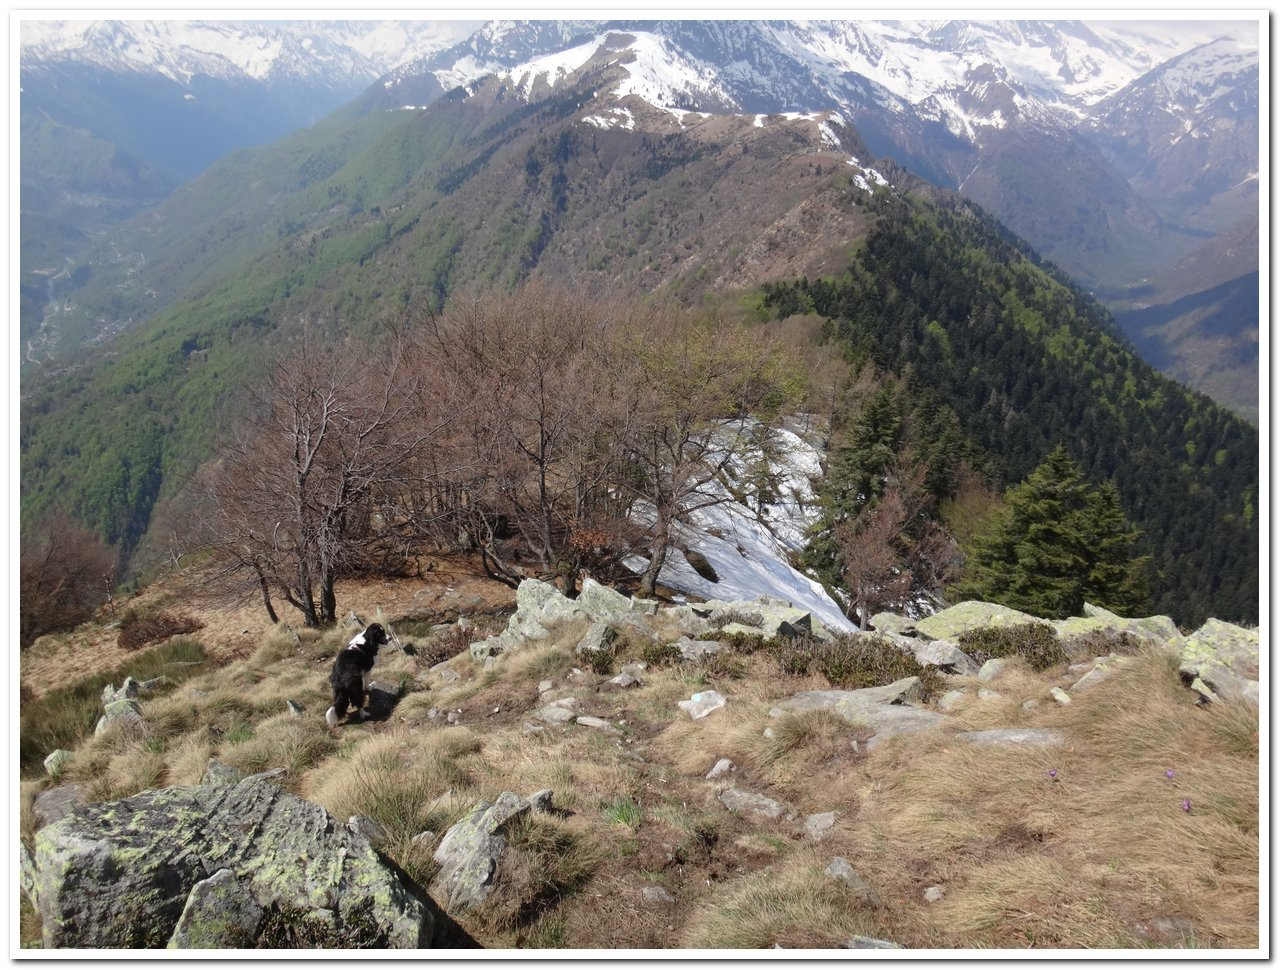 La cresta verso la Colma